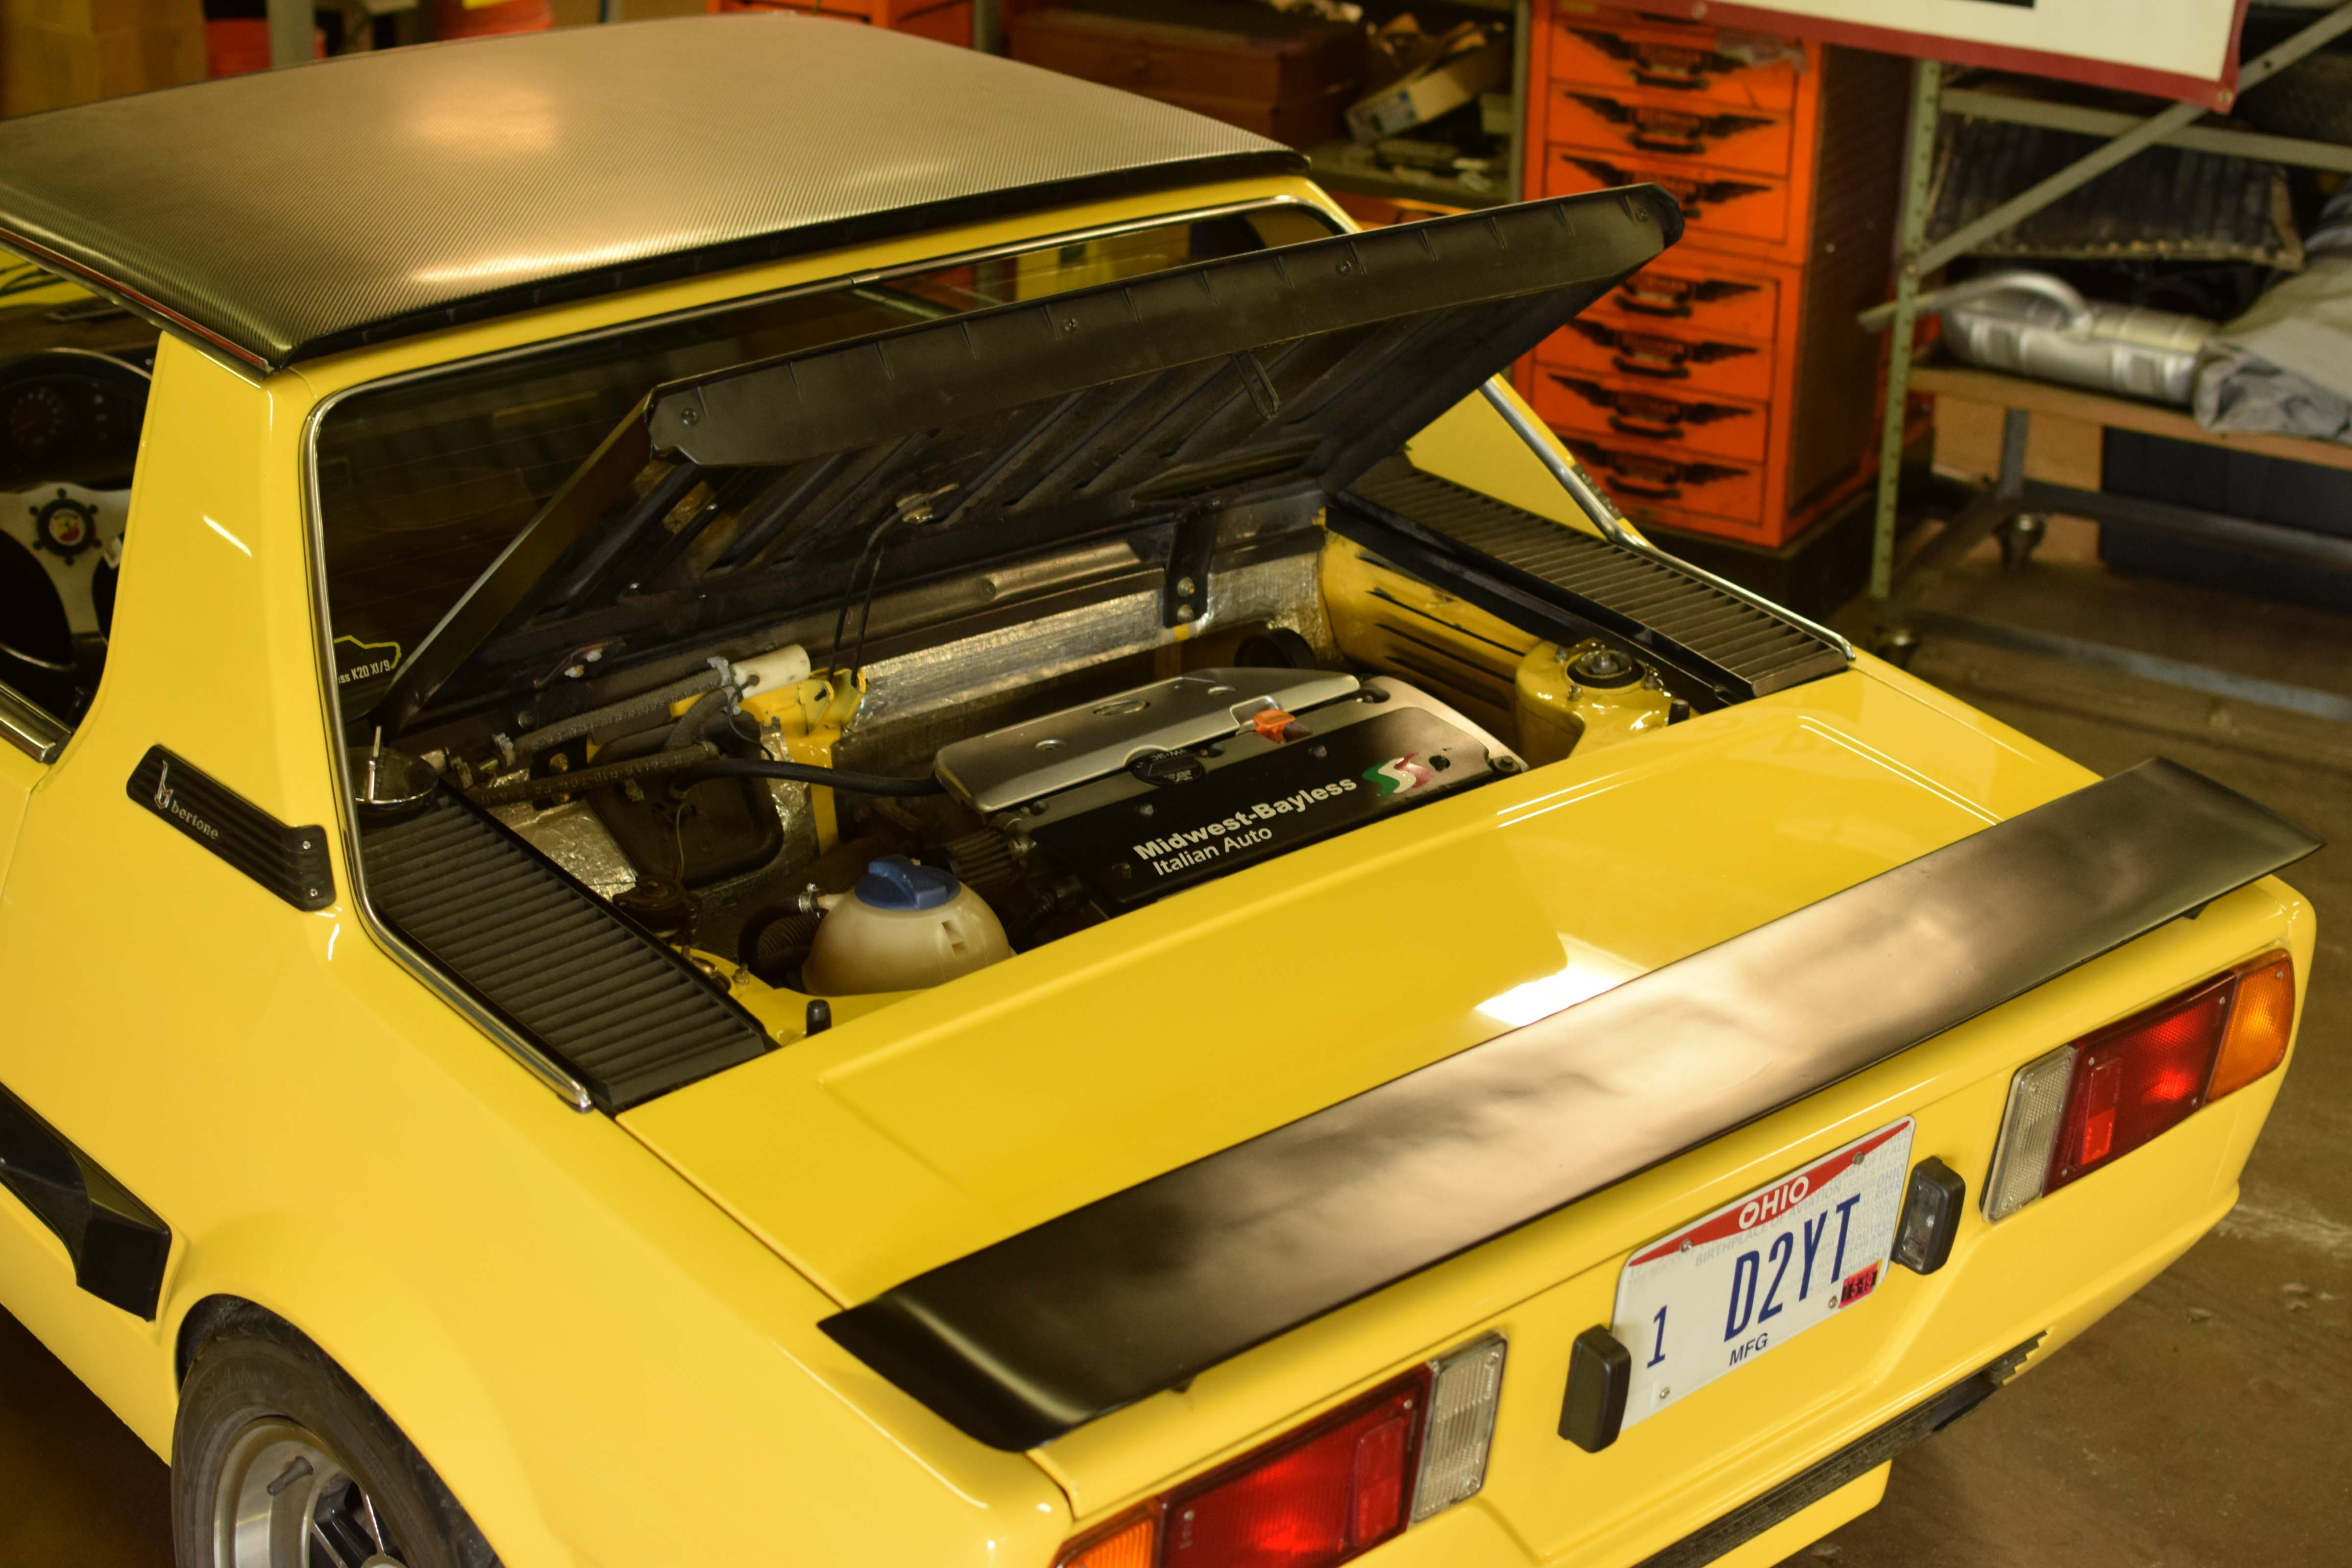 fiat x1/9 engine yellow car